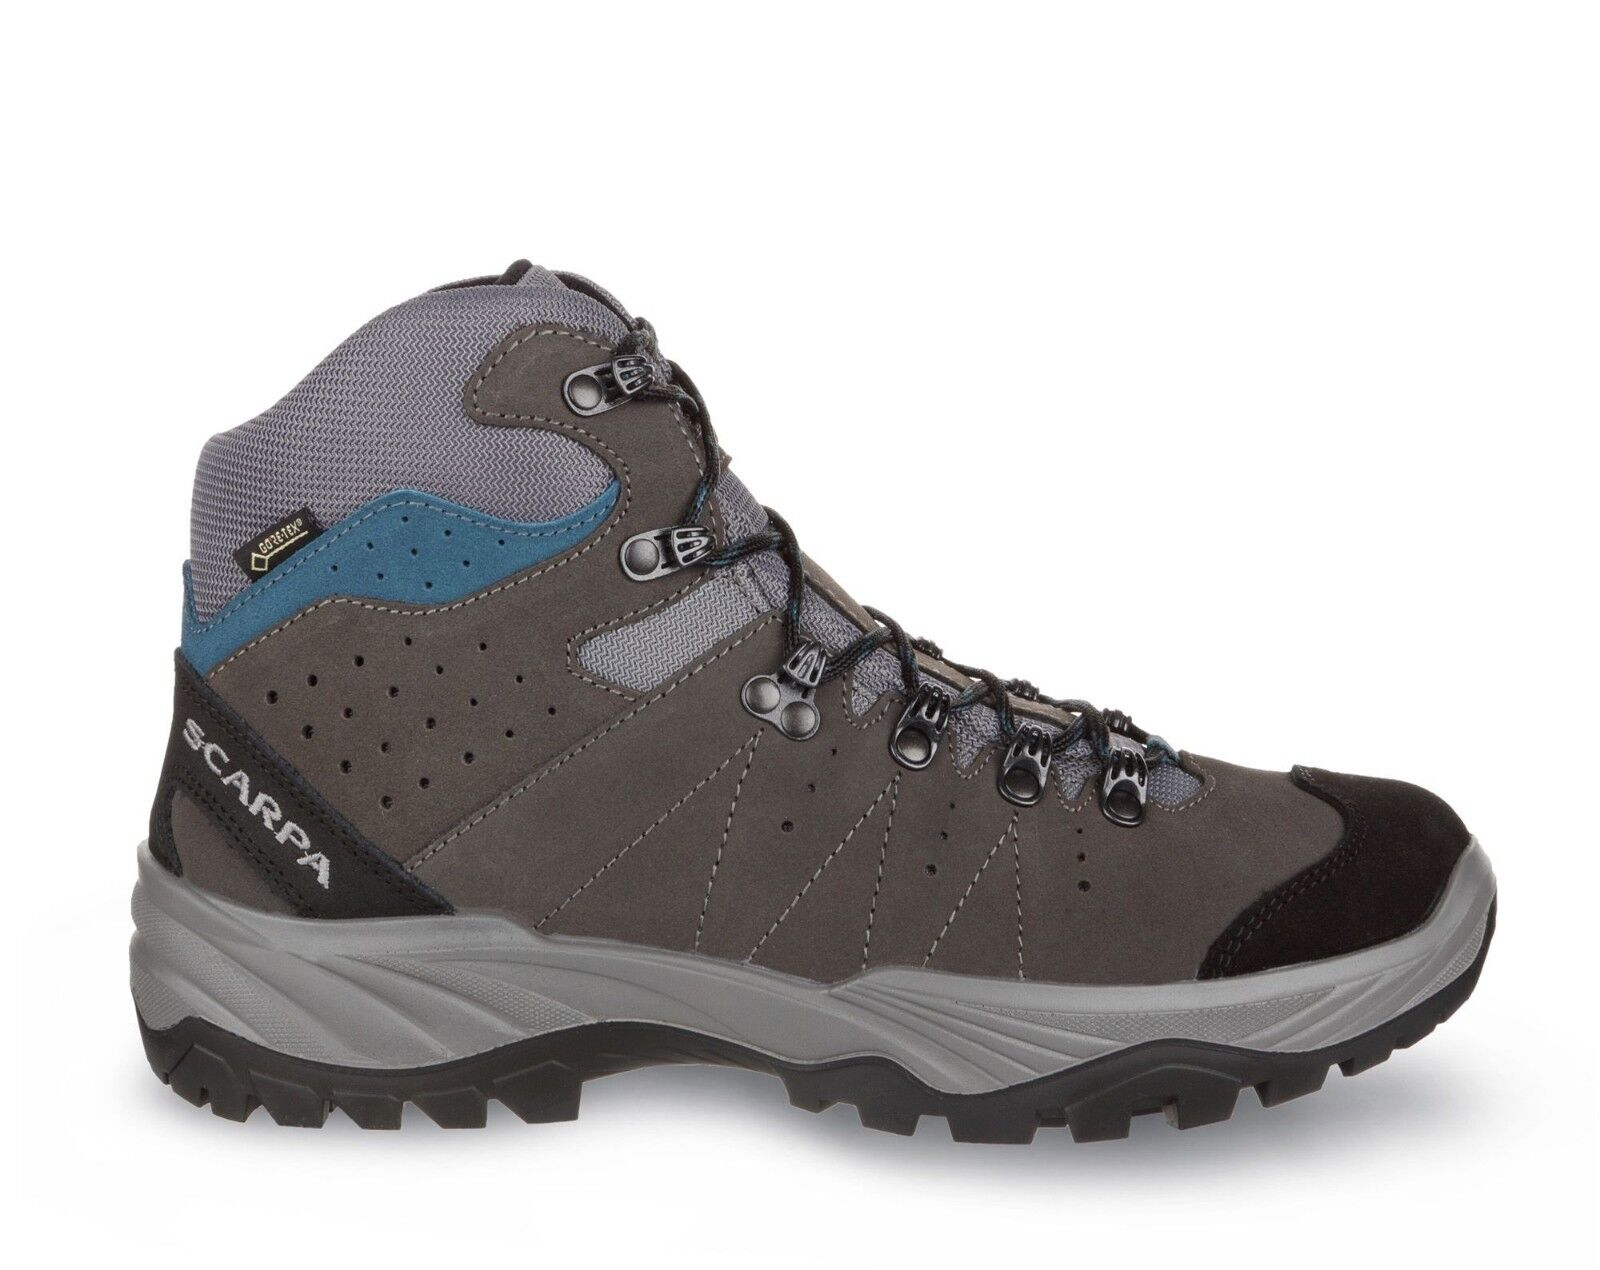 Scarpa Mistral GTX 30026/200 Hiking Smoke/Lake Gore-Tex Vibram Energy II Hiking 30026/200 Stivali 0bfc0b